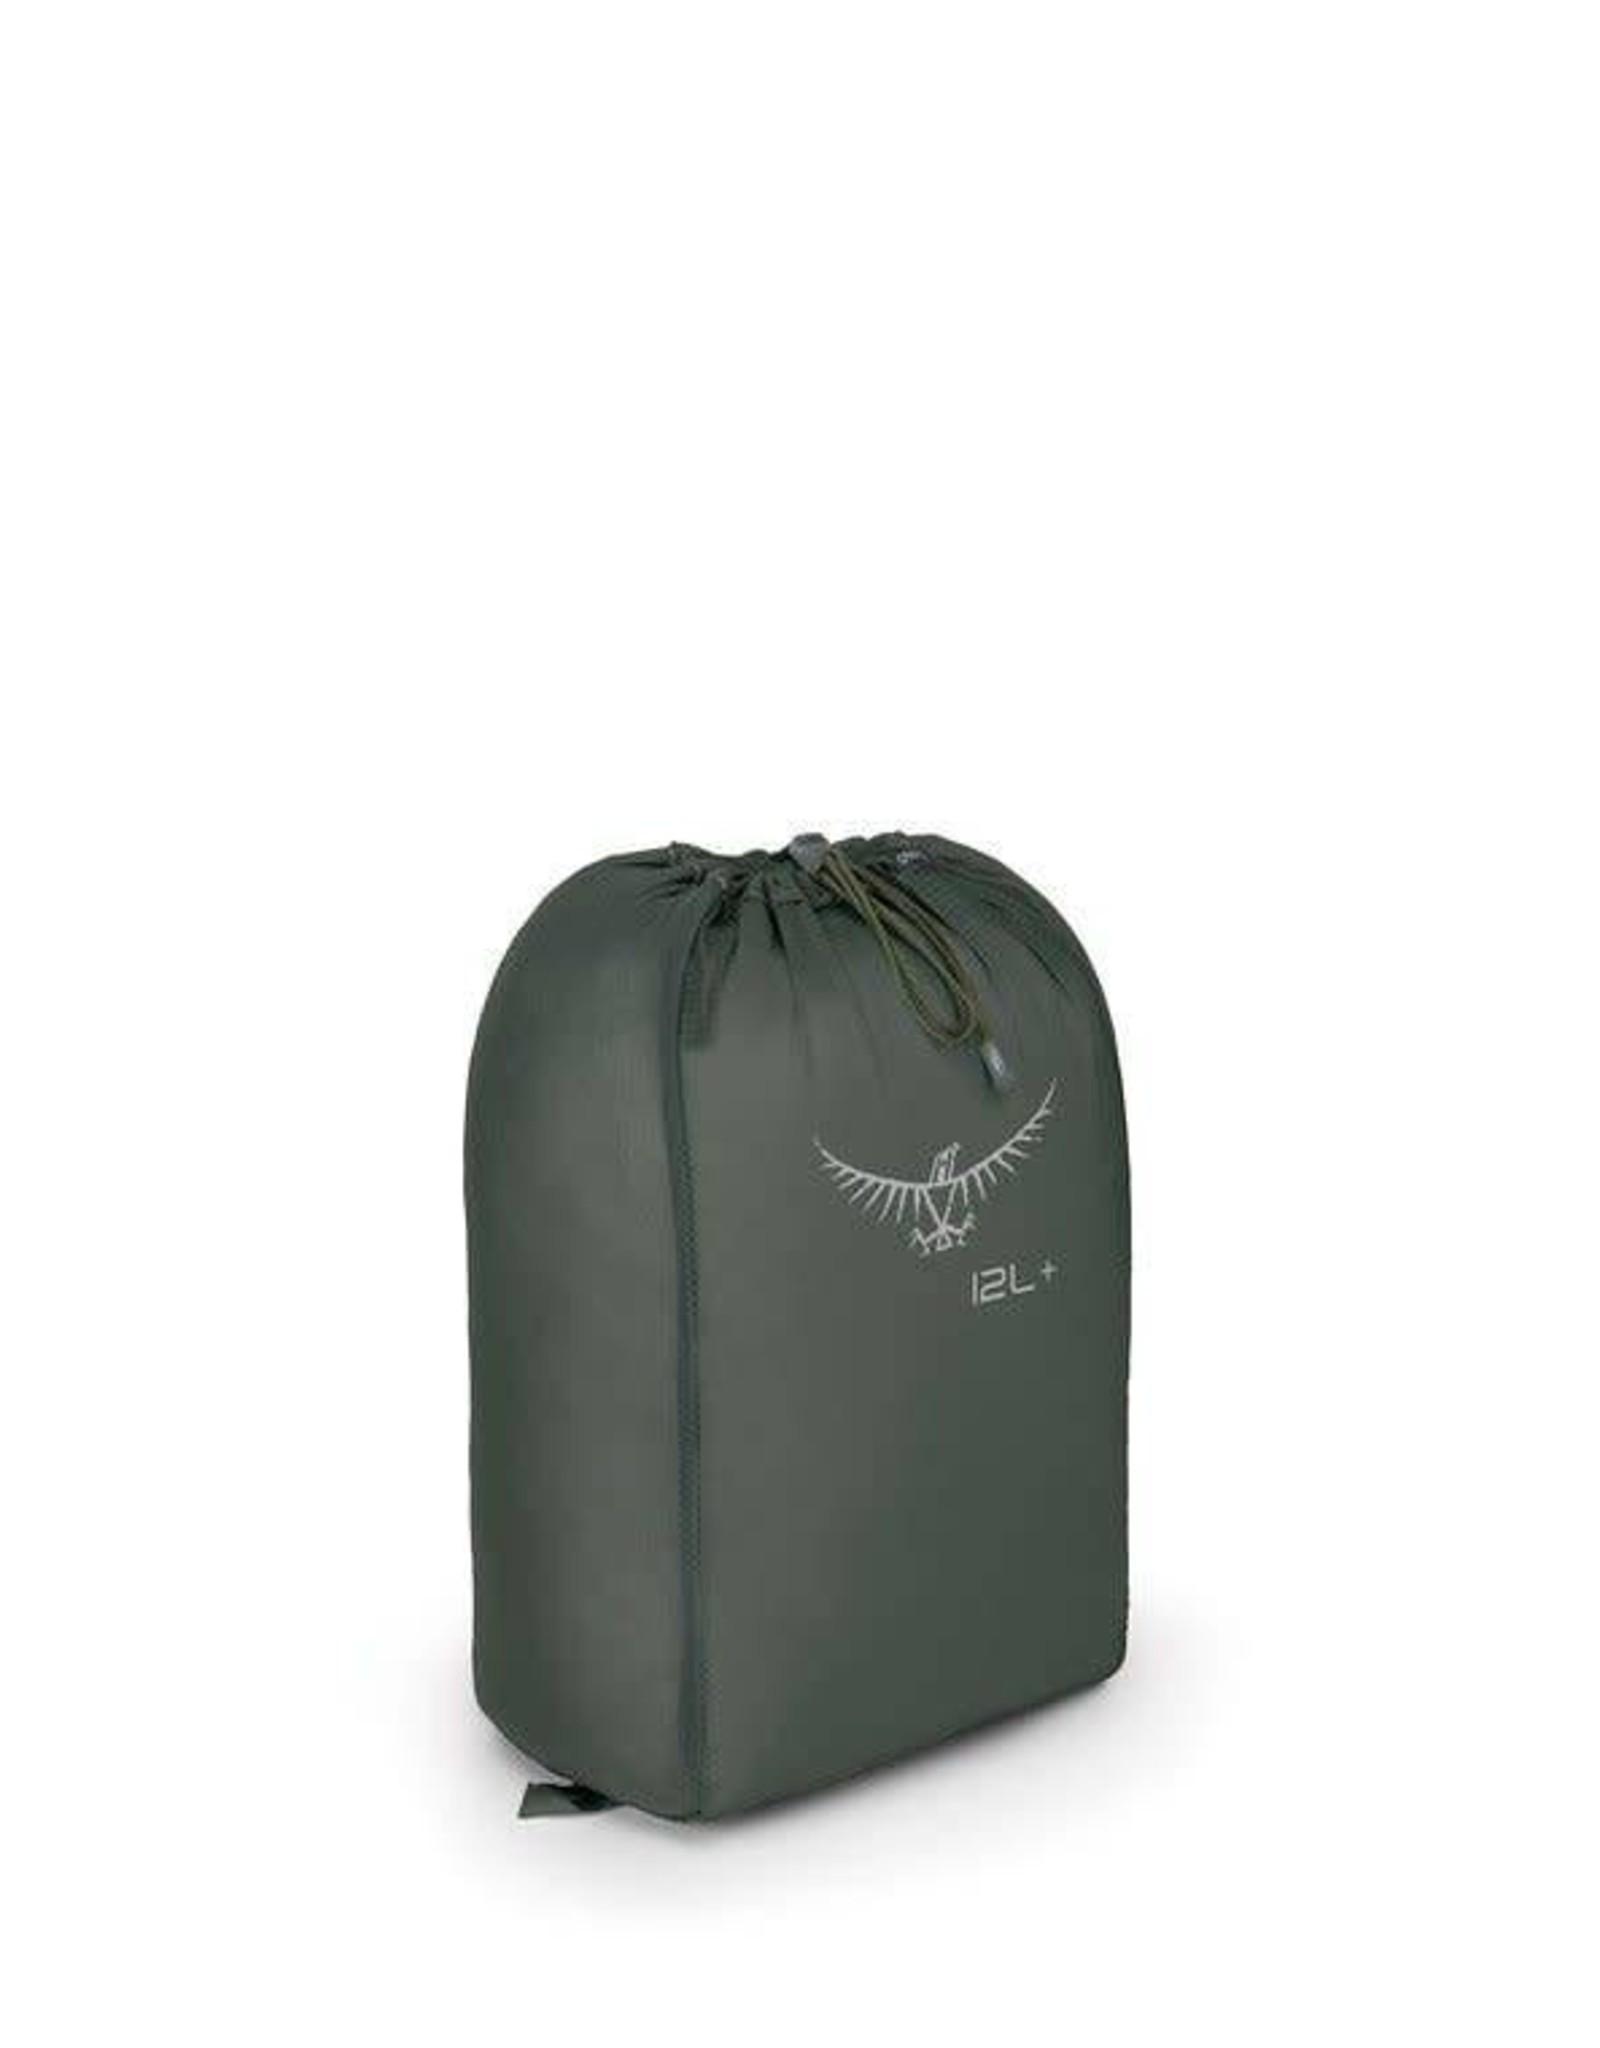 Osprey Osprey UL Stuff Sack 12L S18